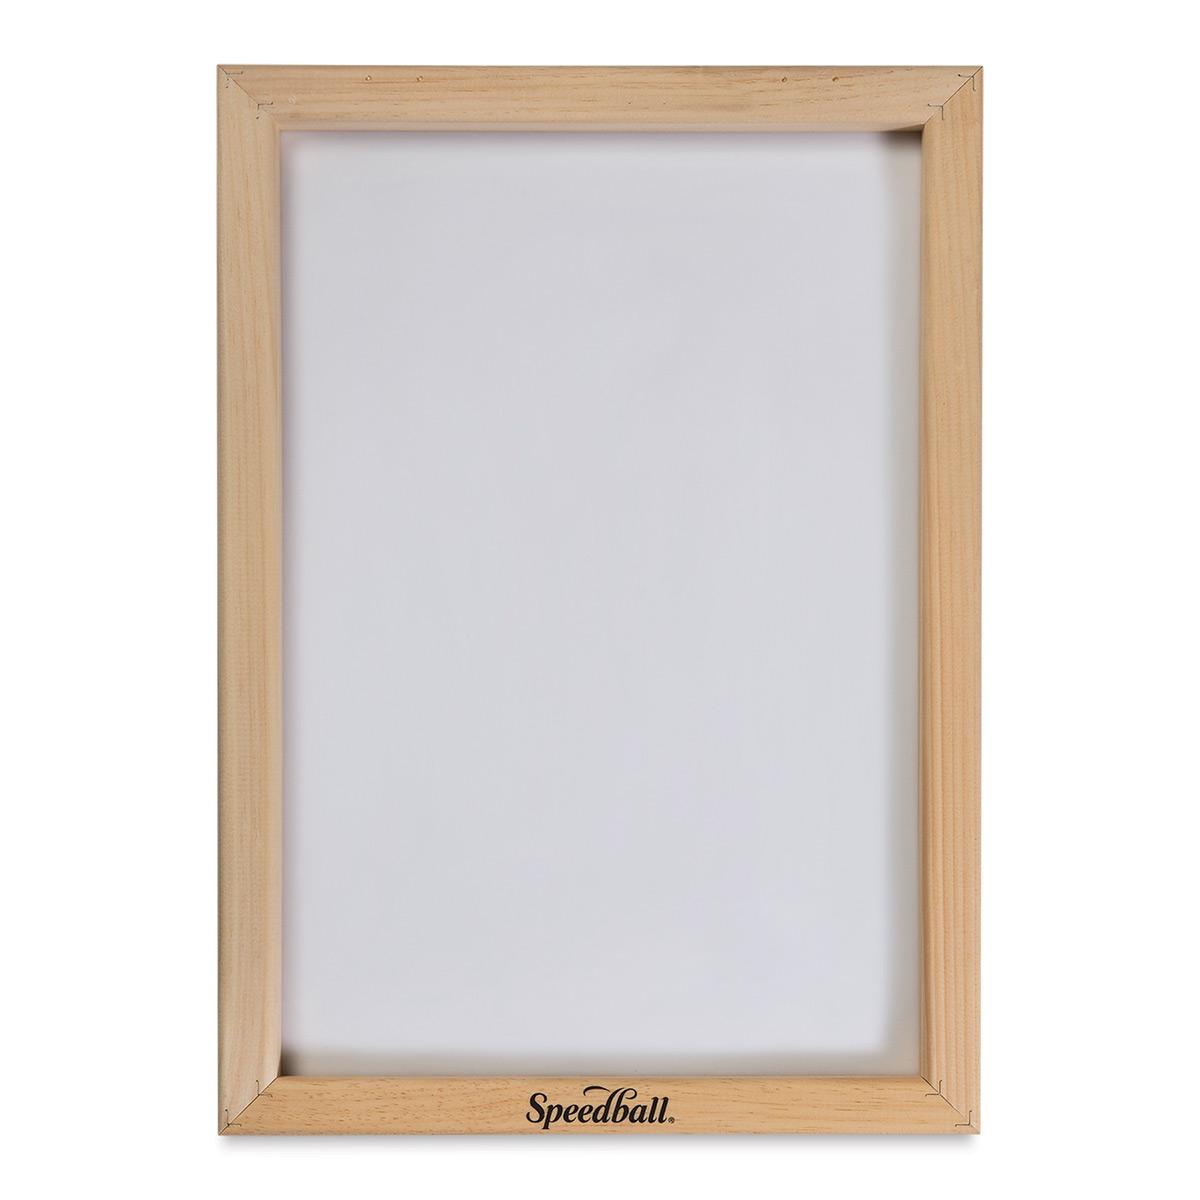 Speedball Screenprinting Frame - 110 Monofilament - 12 x 18